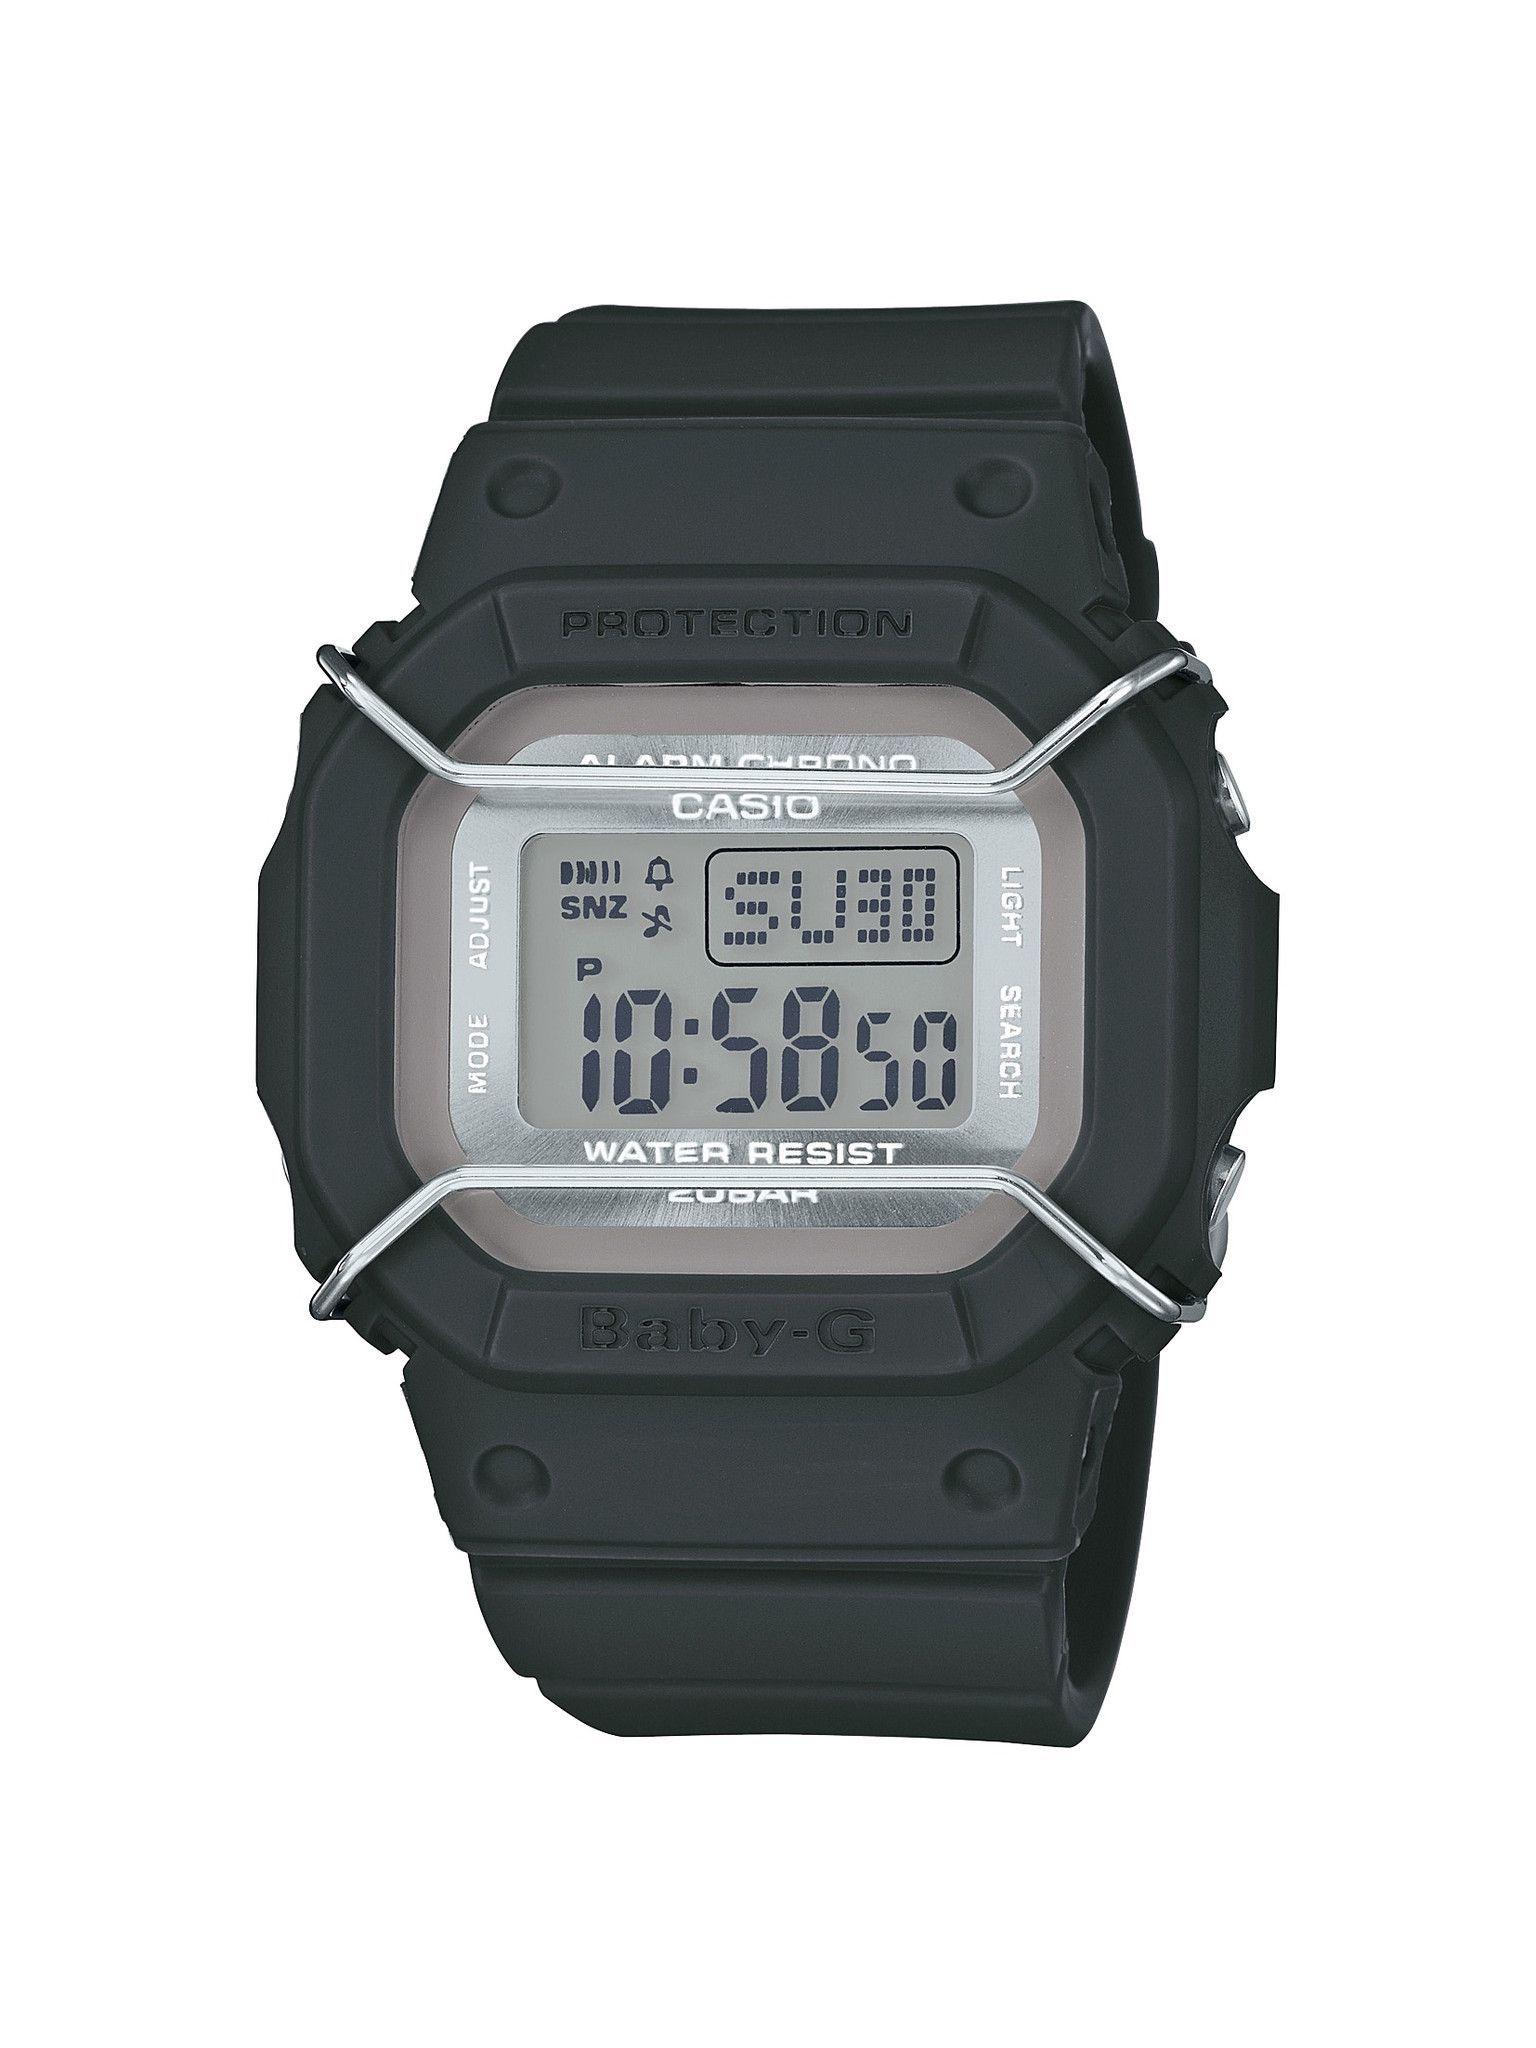 6ccfb2fd647 Casio bgd501um-3